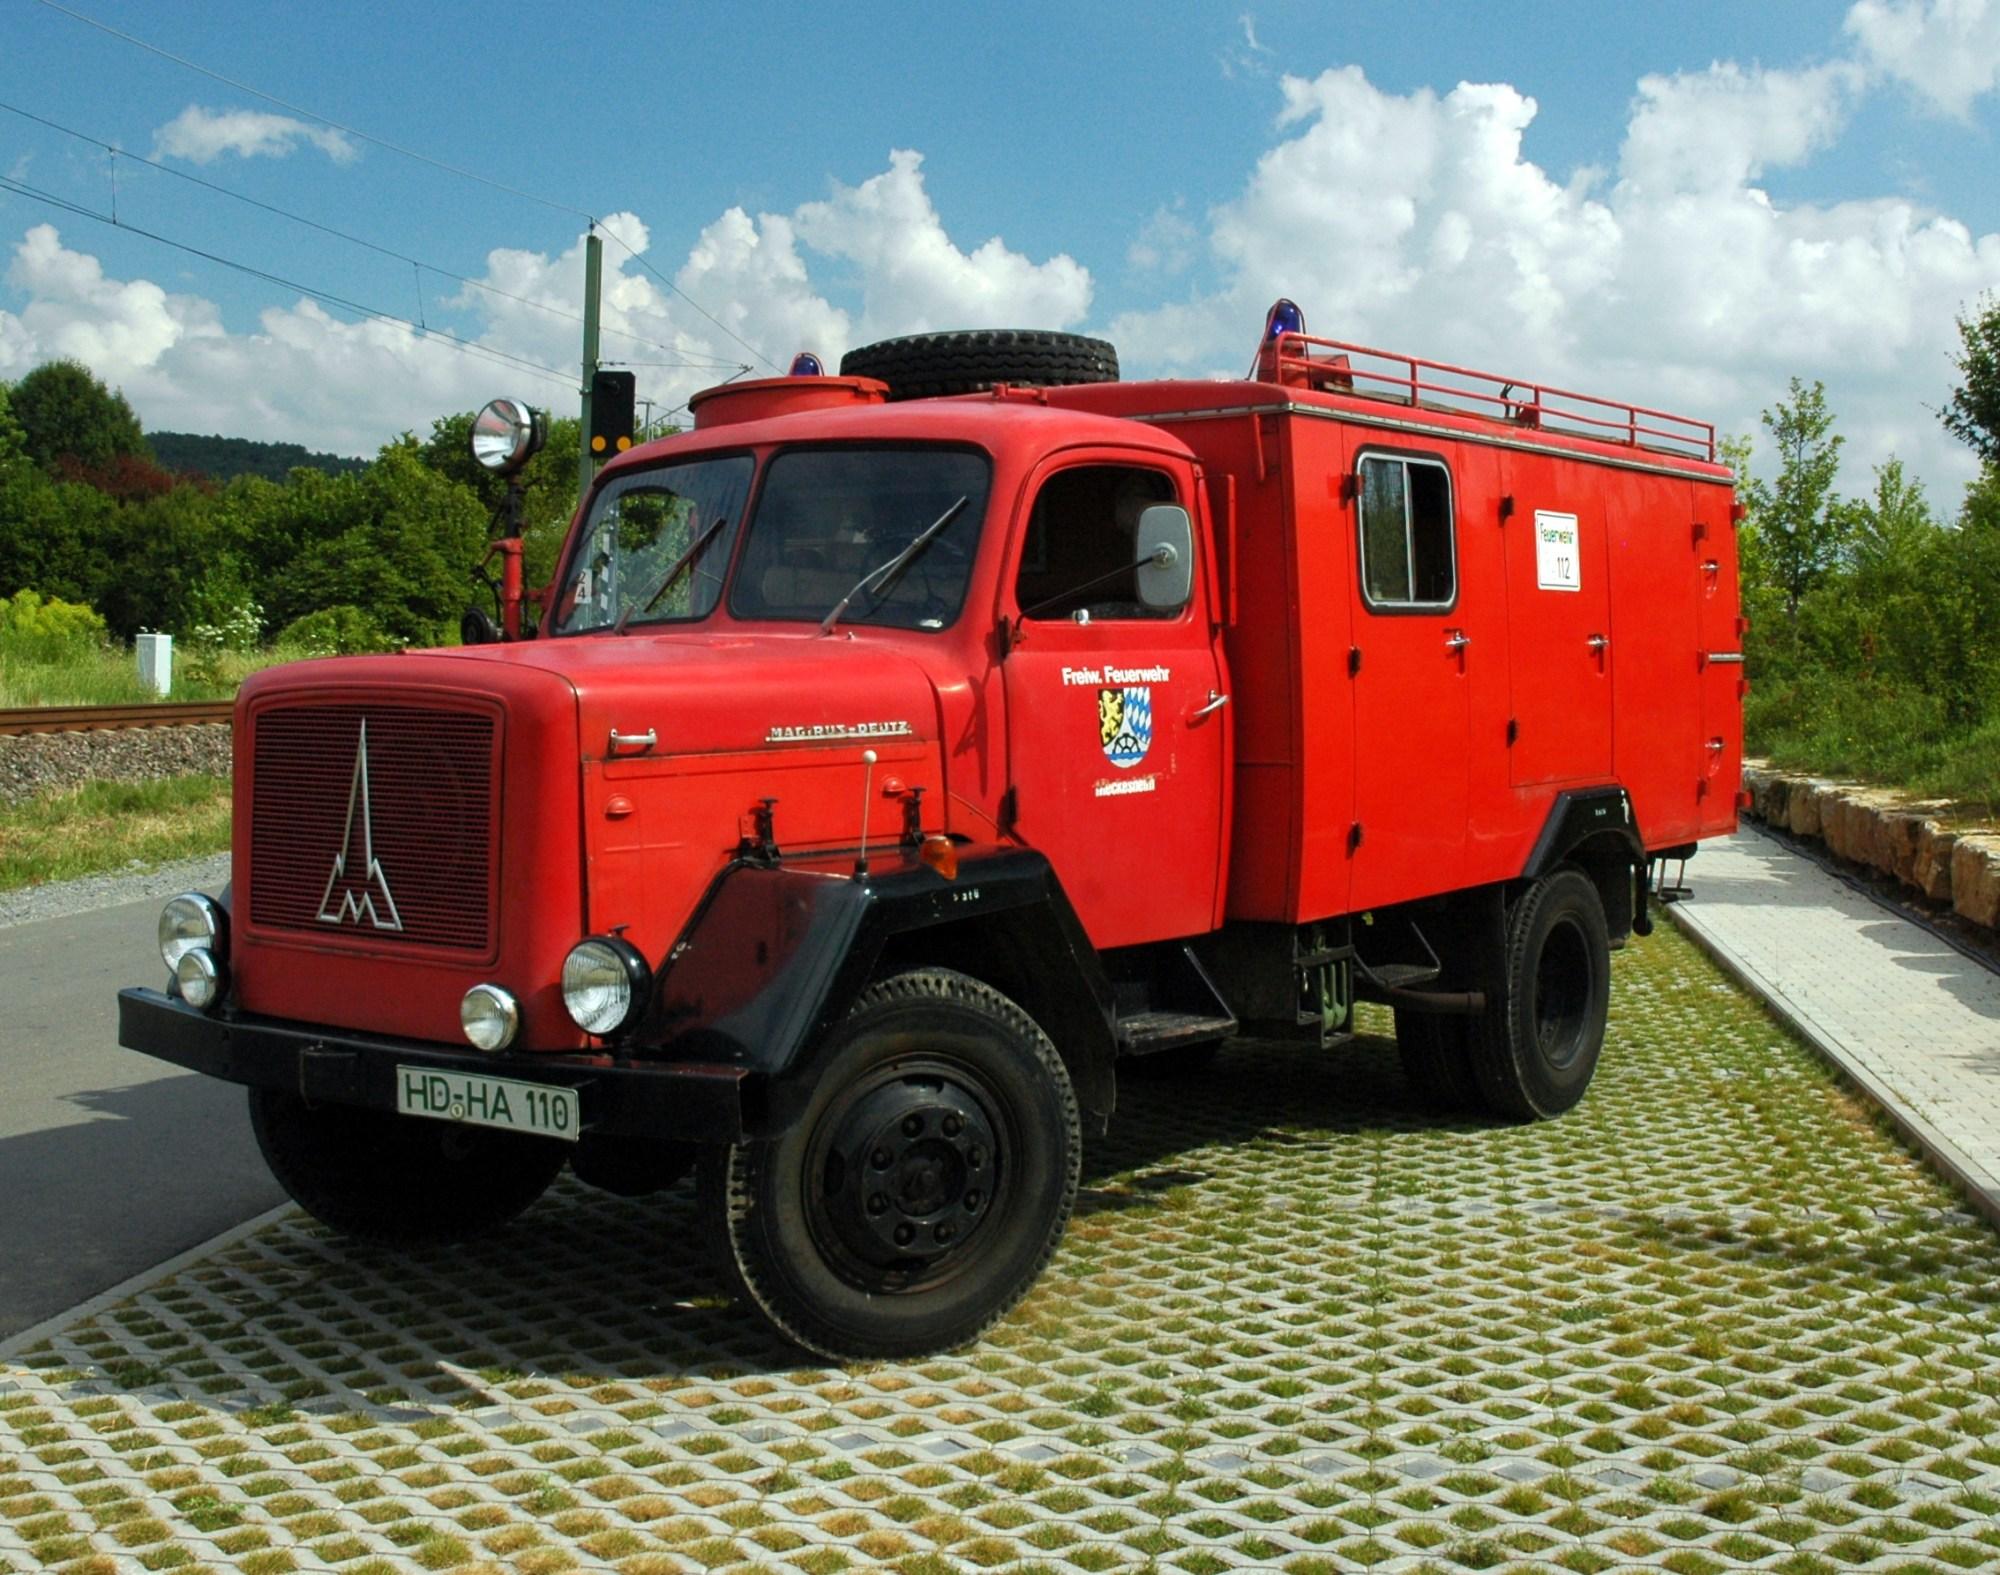 hight resolution of file zuzenhausen feuerwehr meckesheim magirus lf 16ts hd ha 110